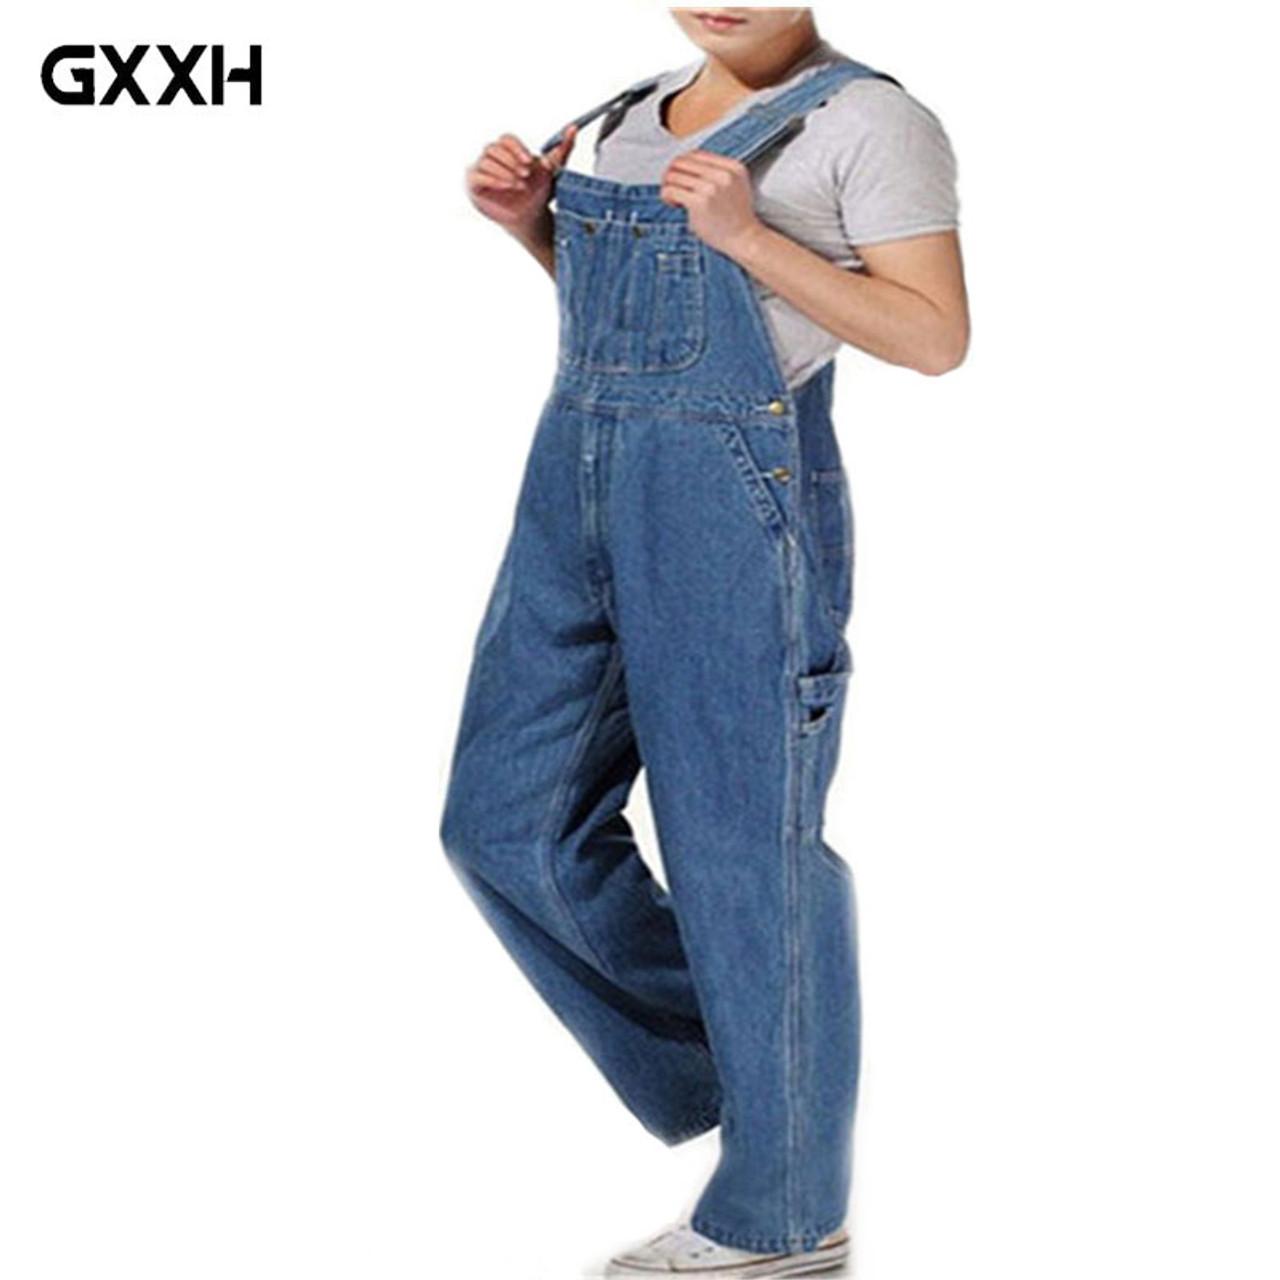 debe64ef4e0b Hot 2018 Men s Plus Size 26-44 46 Overalls Large Size Huge Denim Bib Pants  ...